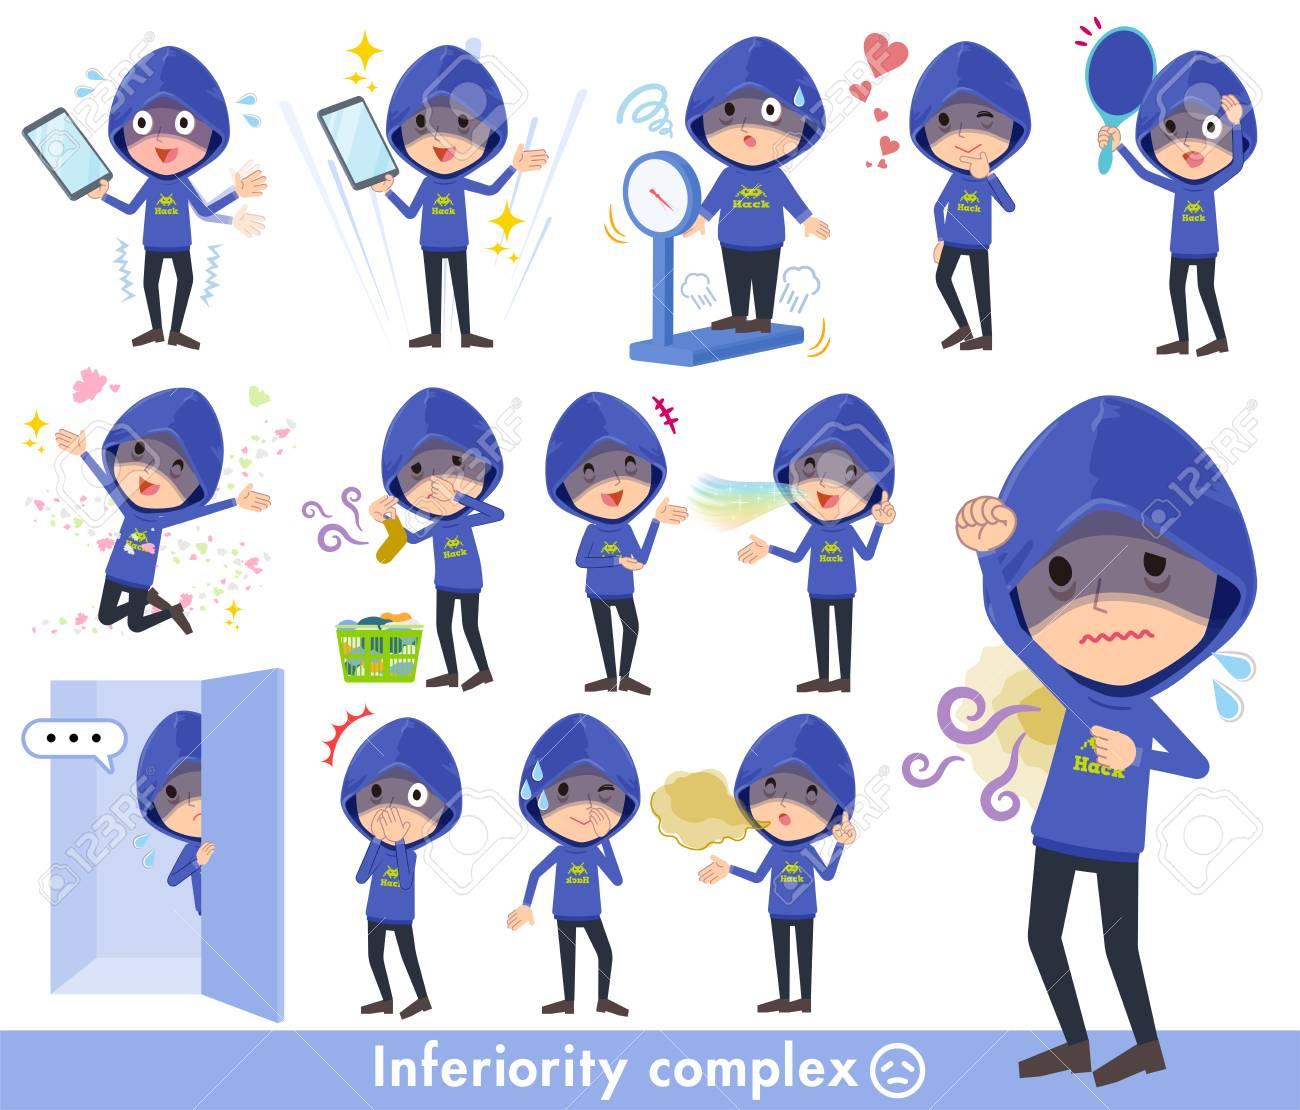 Blue hacker men in complex. - 94276986